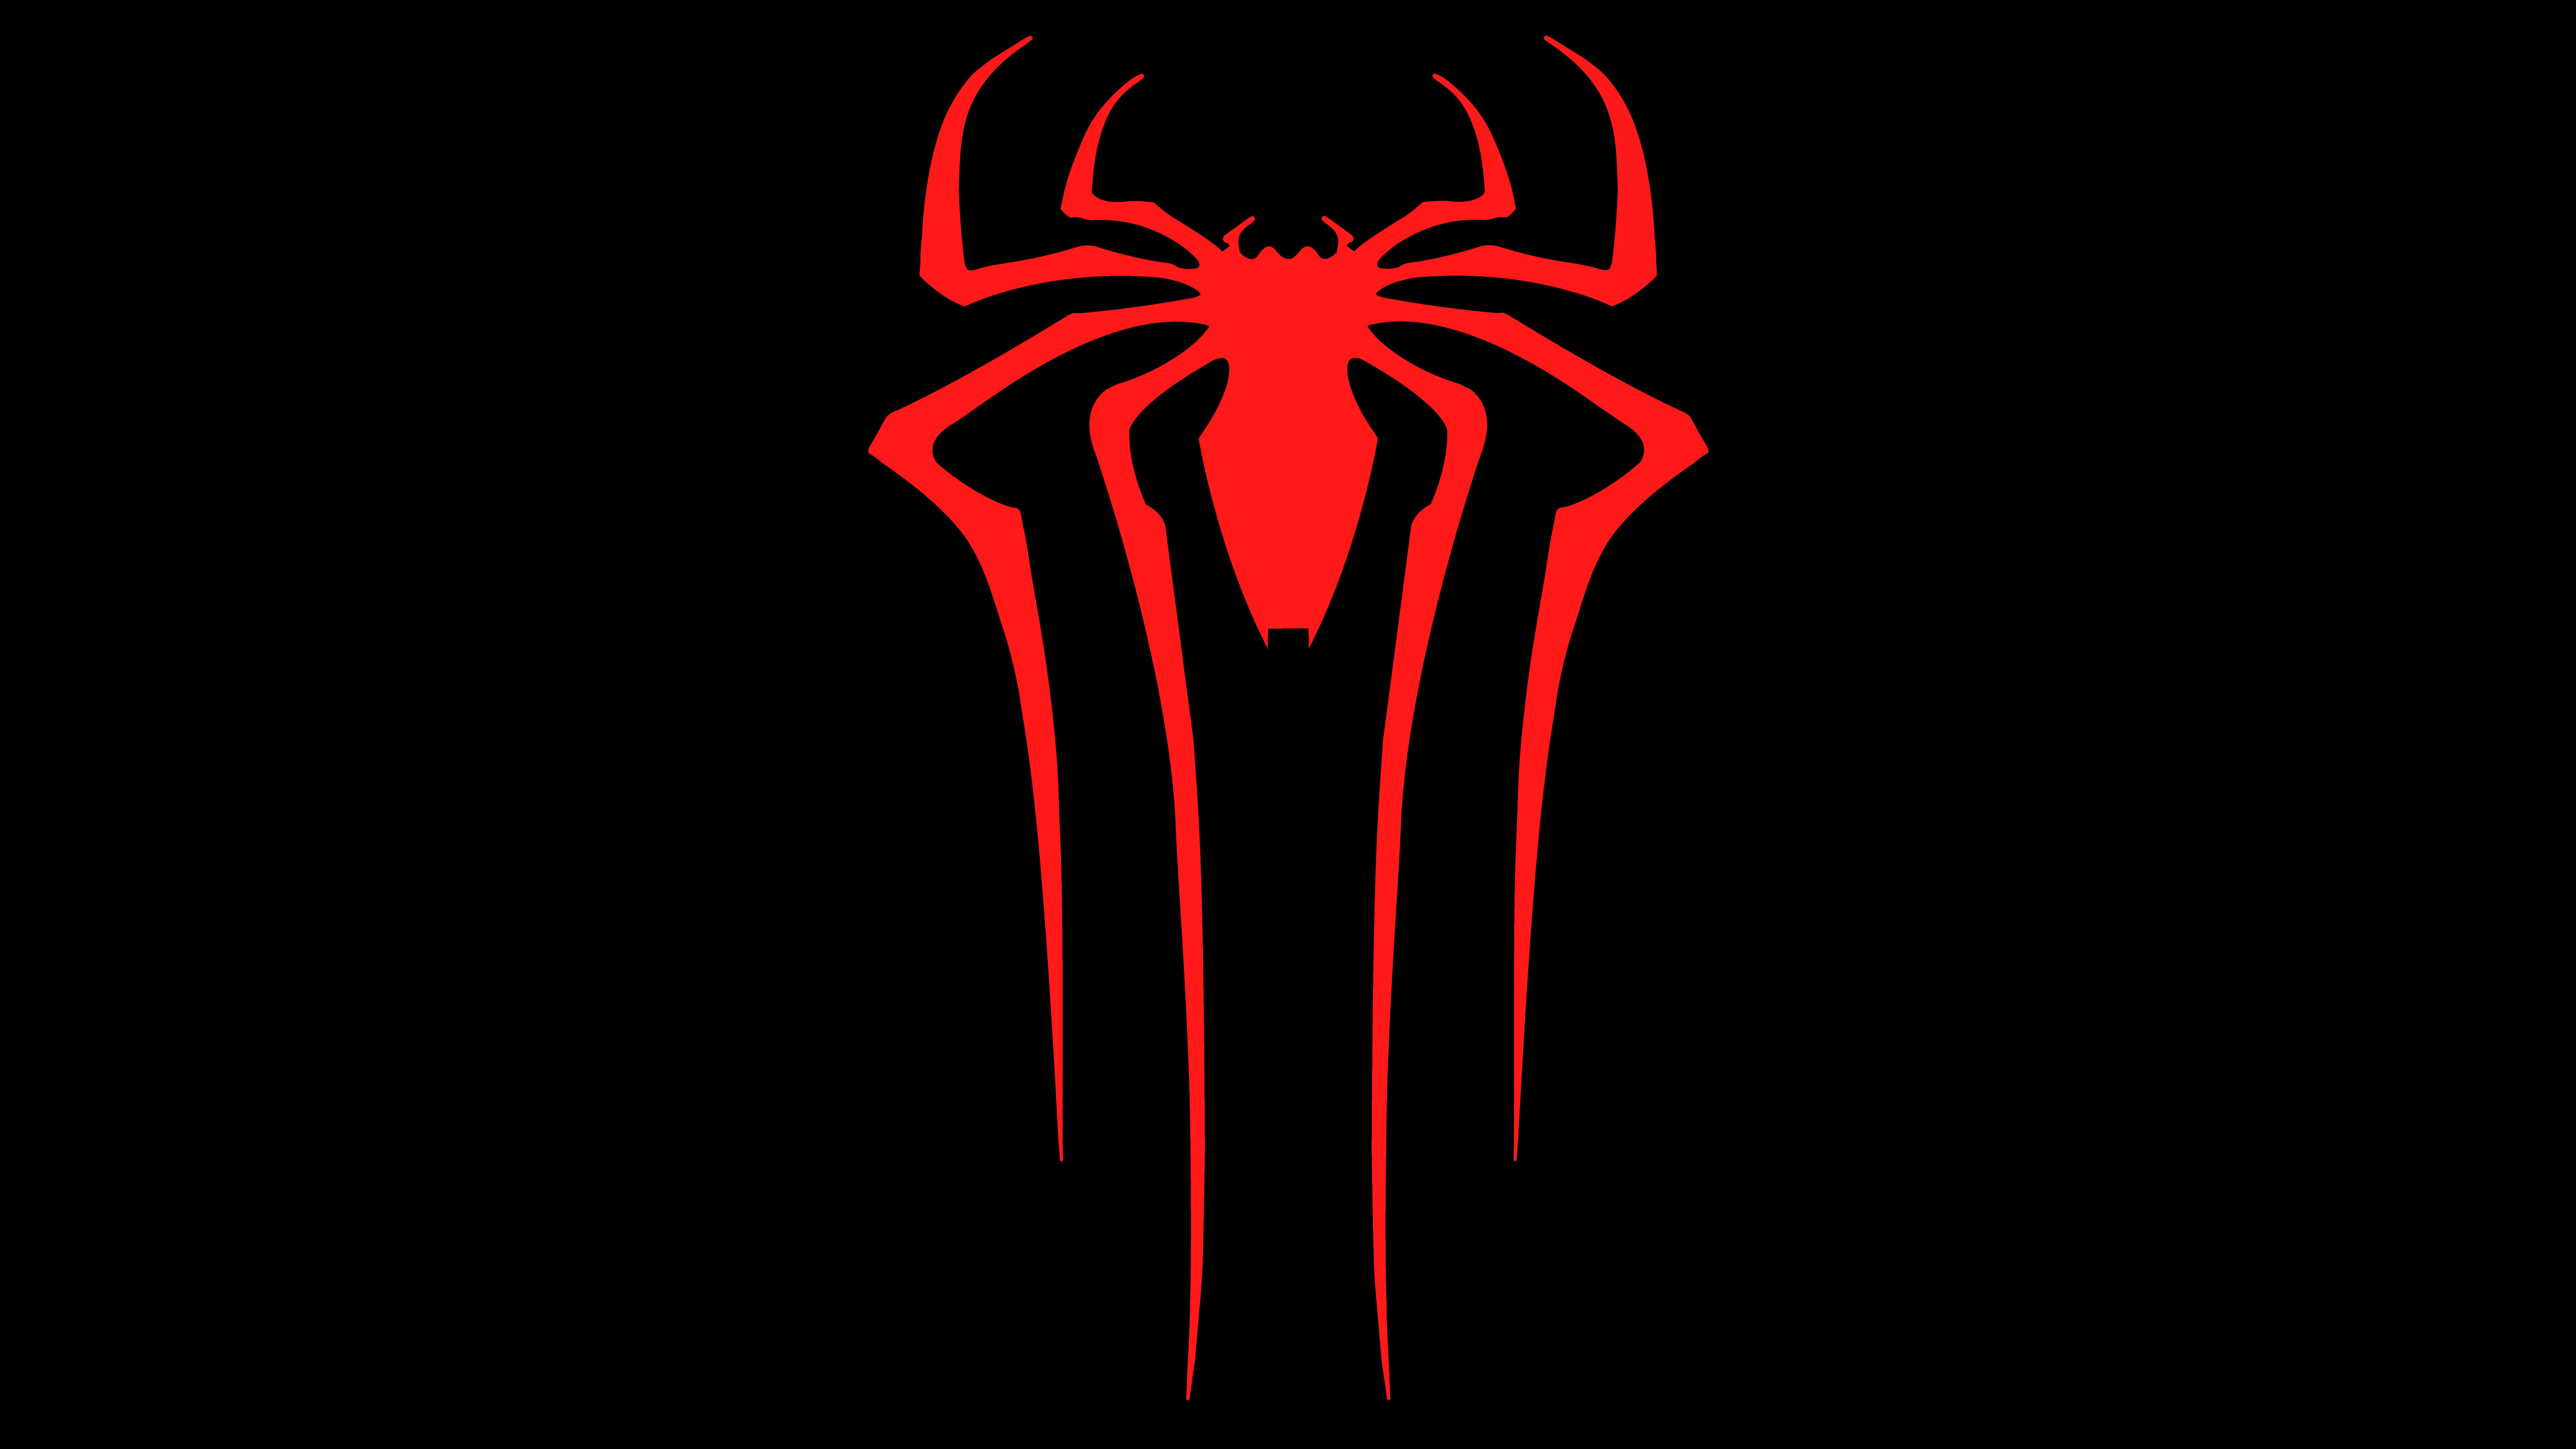 Image Result For Spiderman Costume Black K Ultra Hd Pc Wallpaper